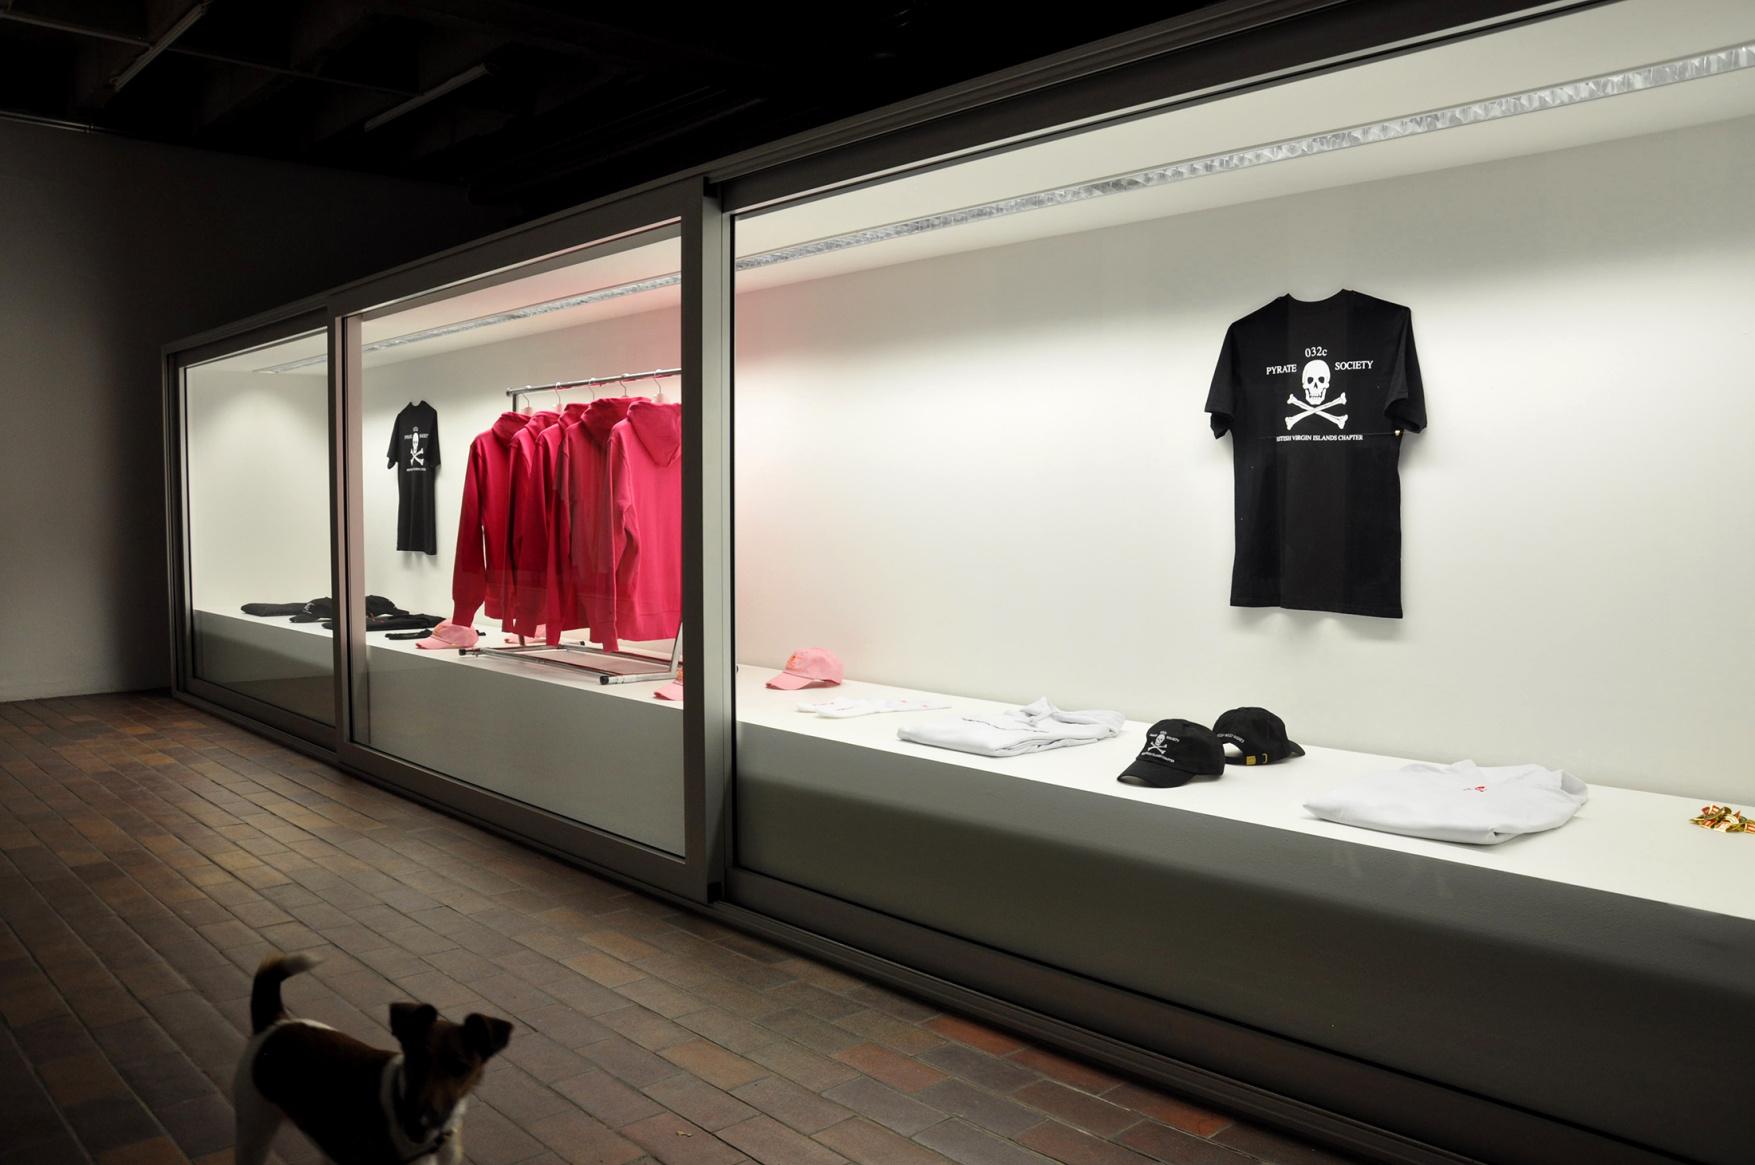 032c-store-opening-berlin-6